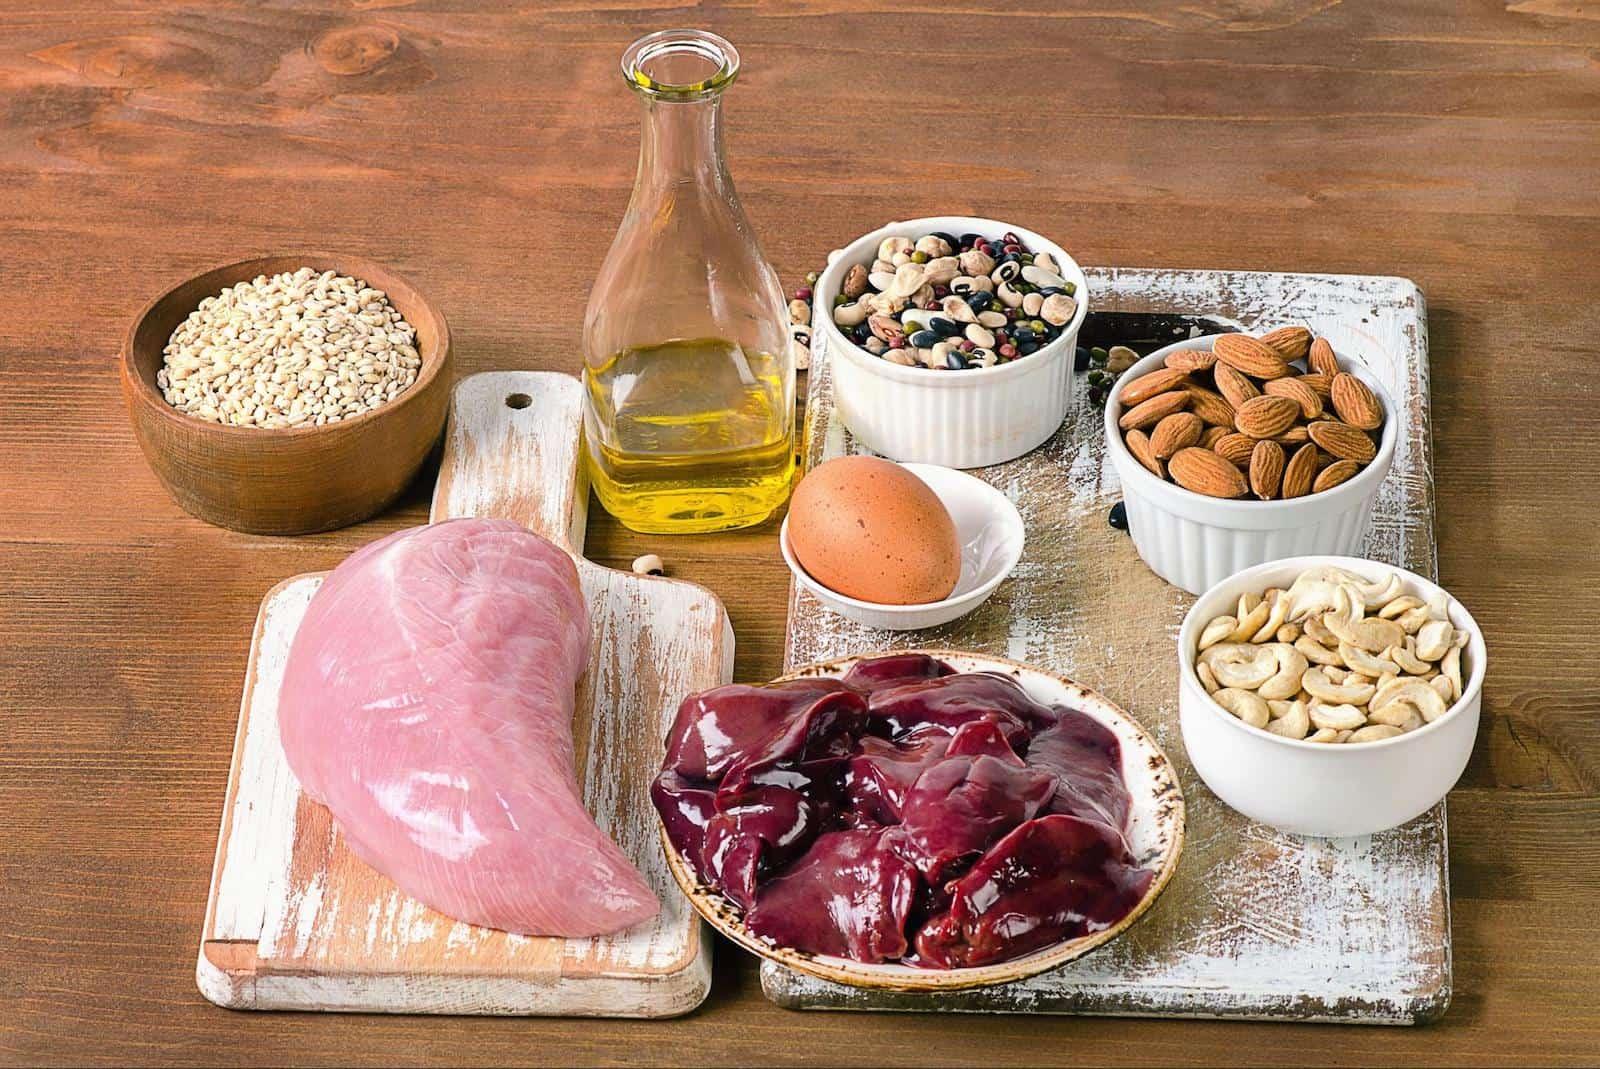 Natural remedies for hyperthyroidism: Food high in selenium